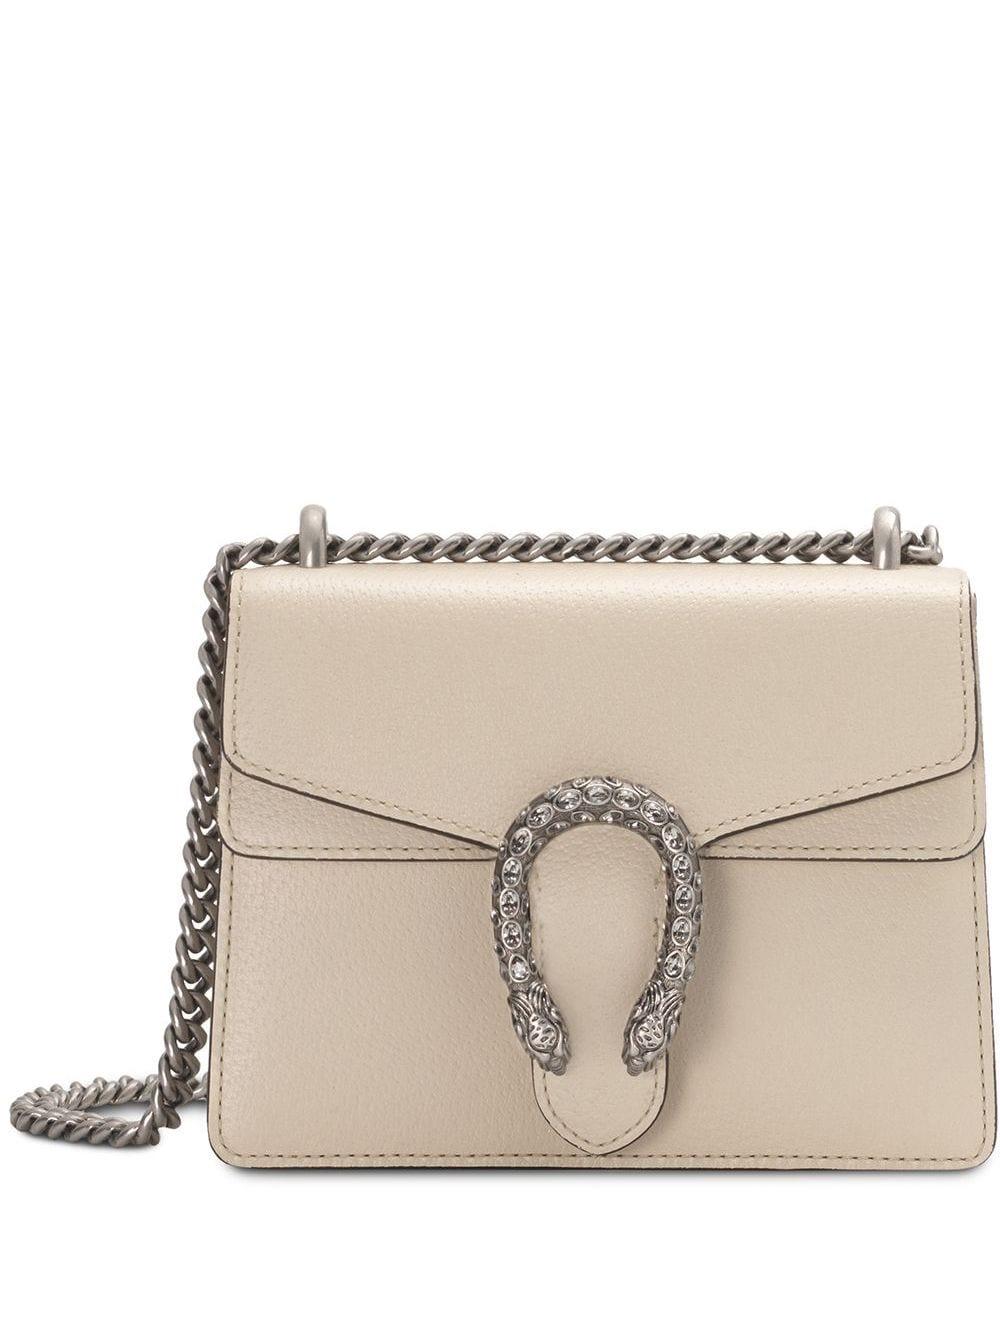 Dionysus Mini Leather Shoulder Bag